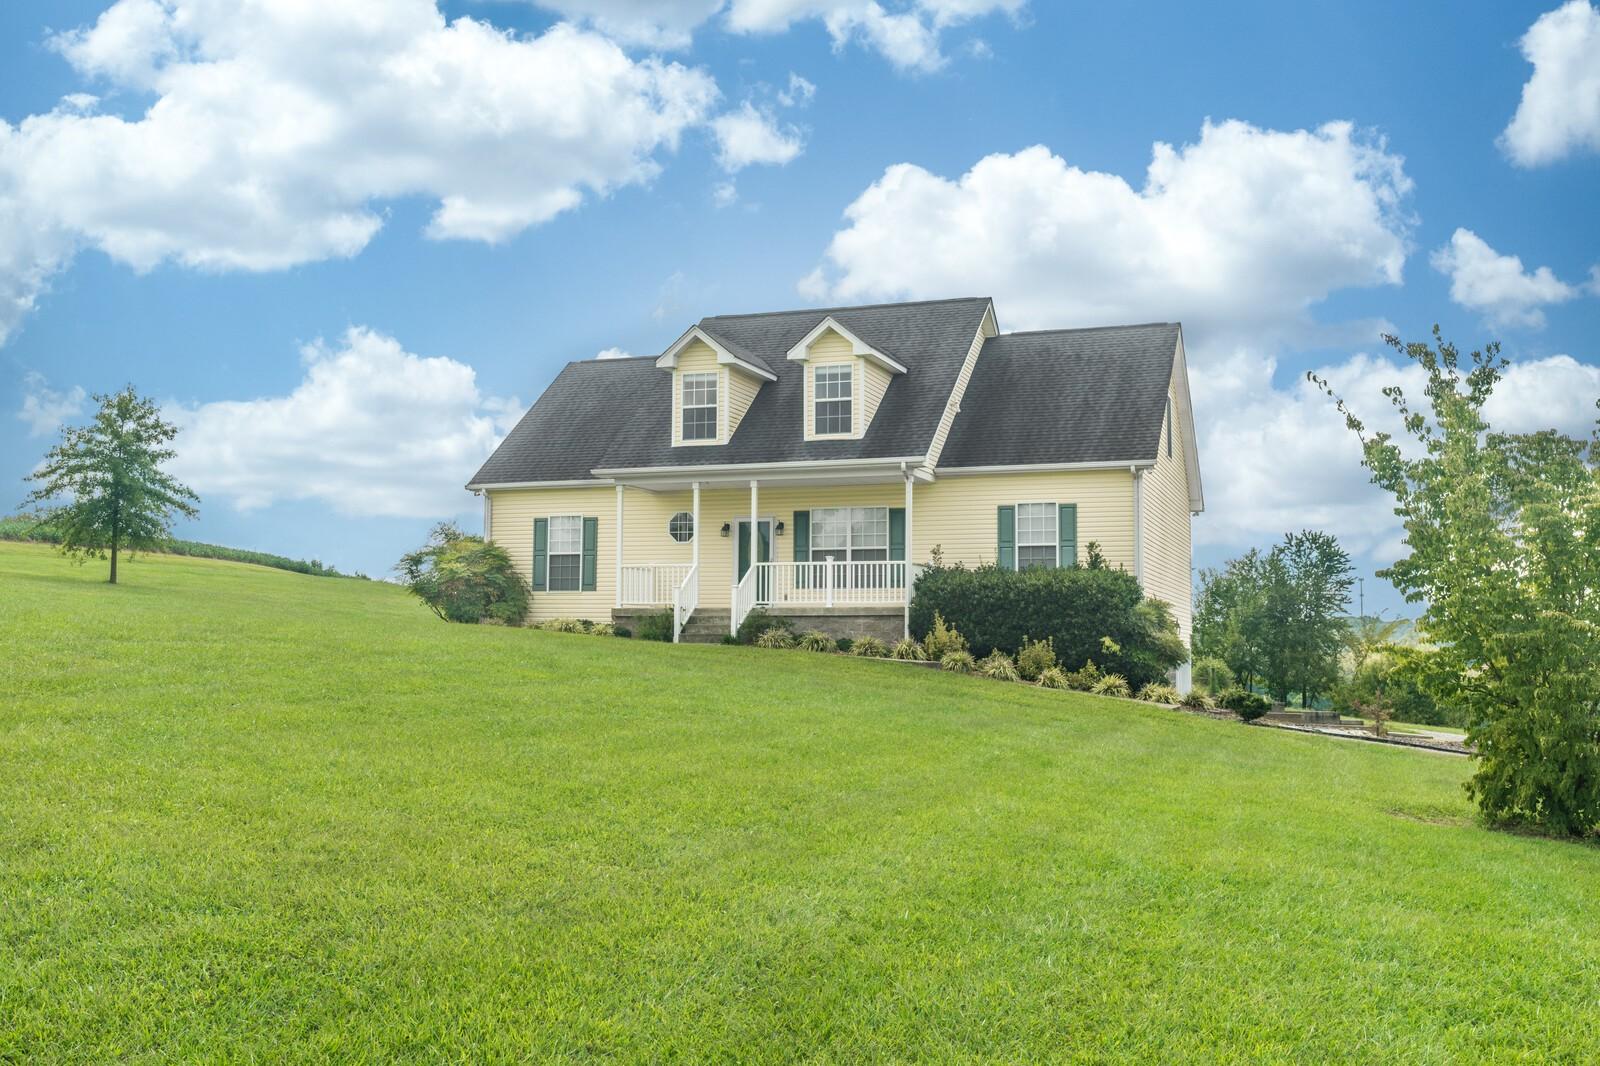 3017 Covington Dr Property Photo - Cross Plains, TN real estate listing